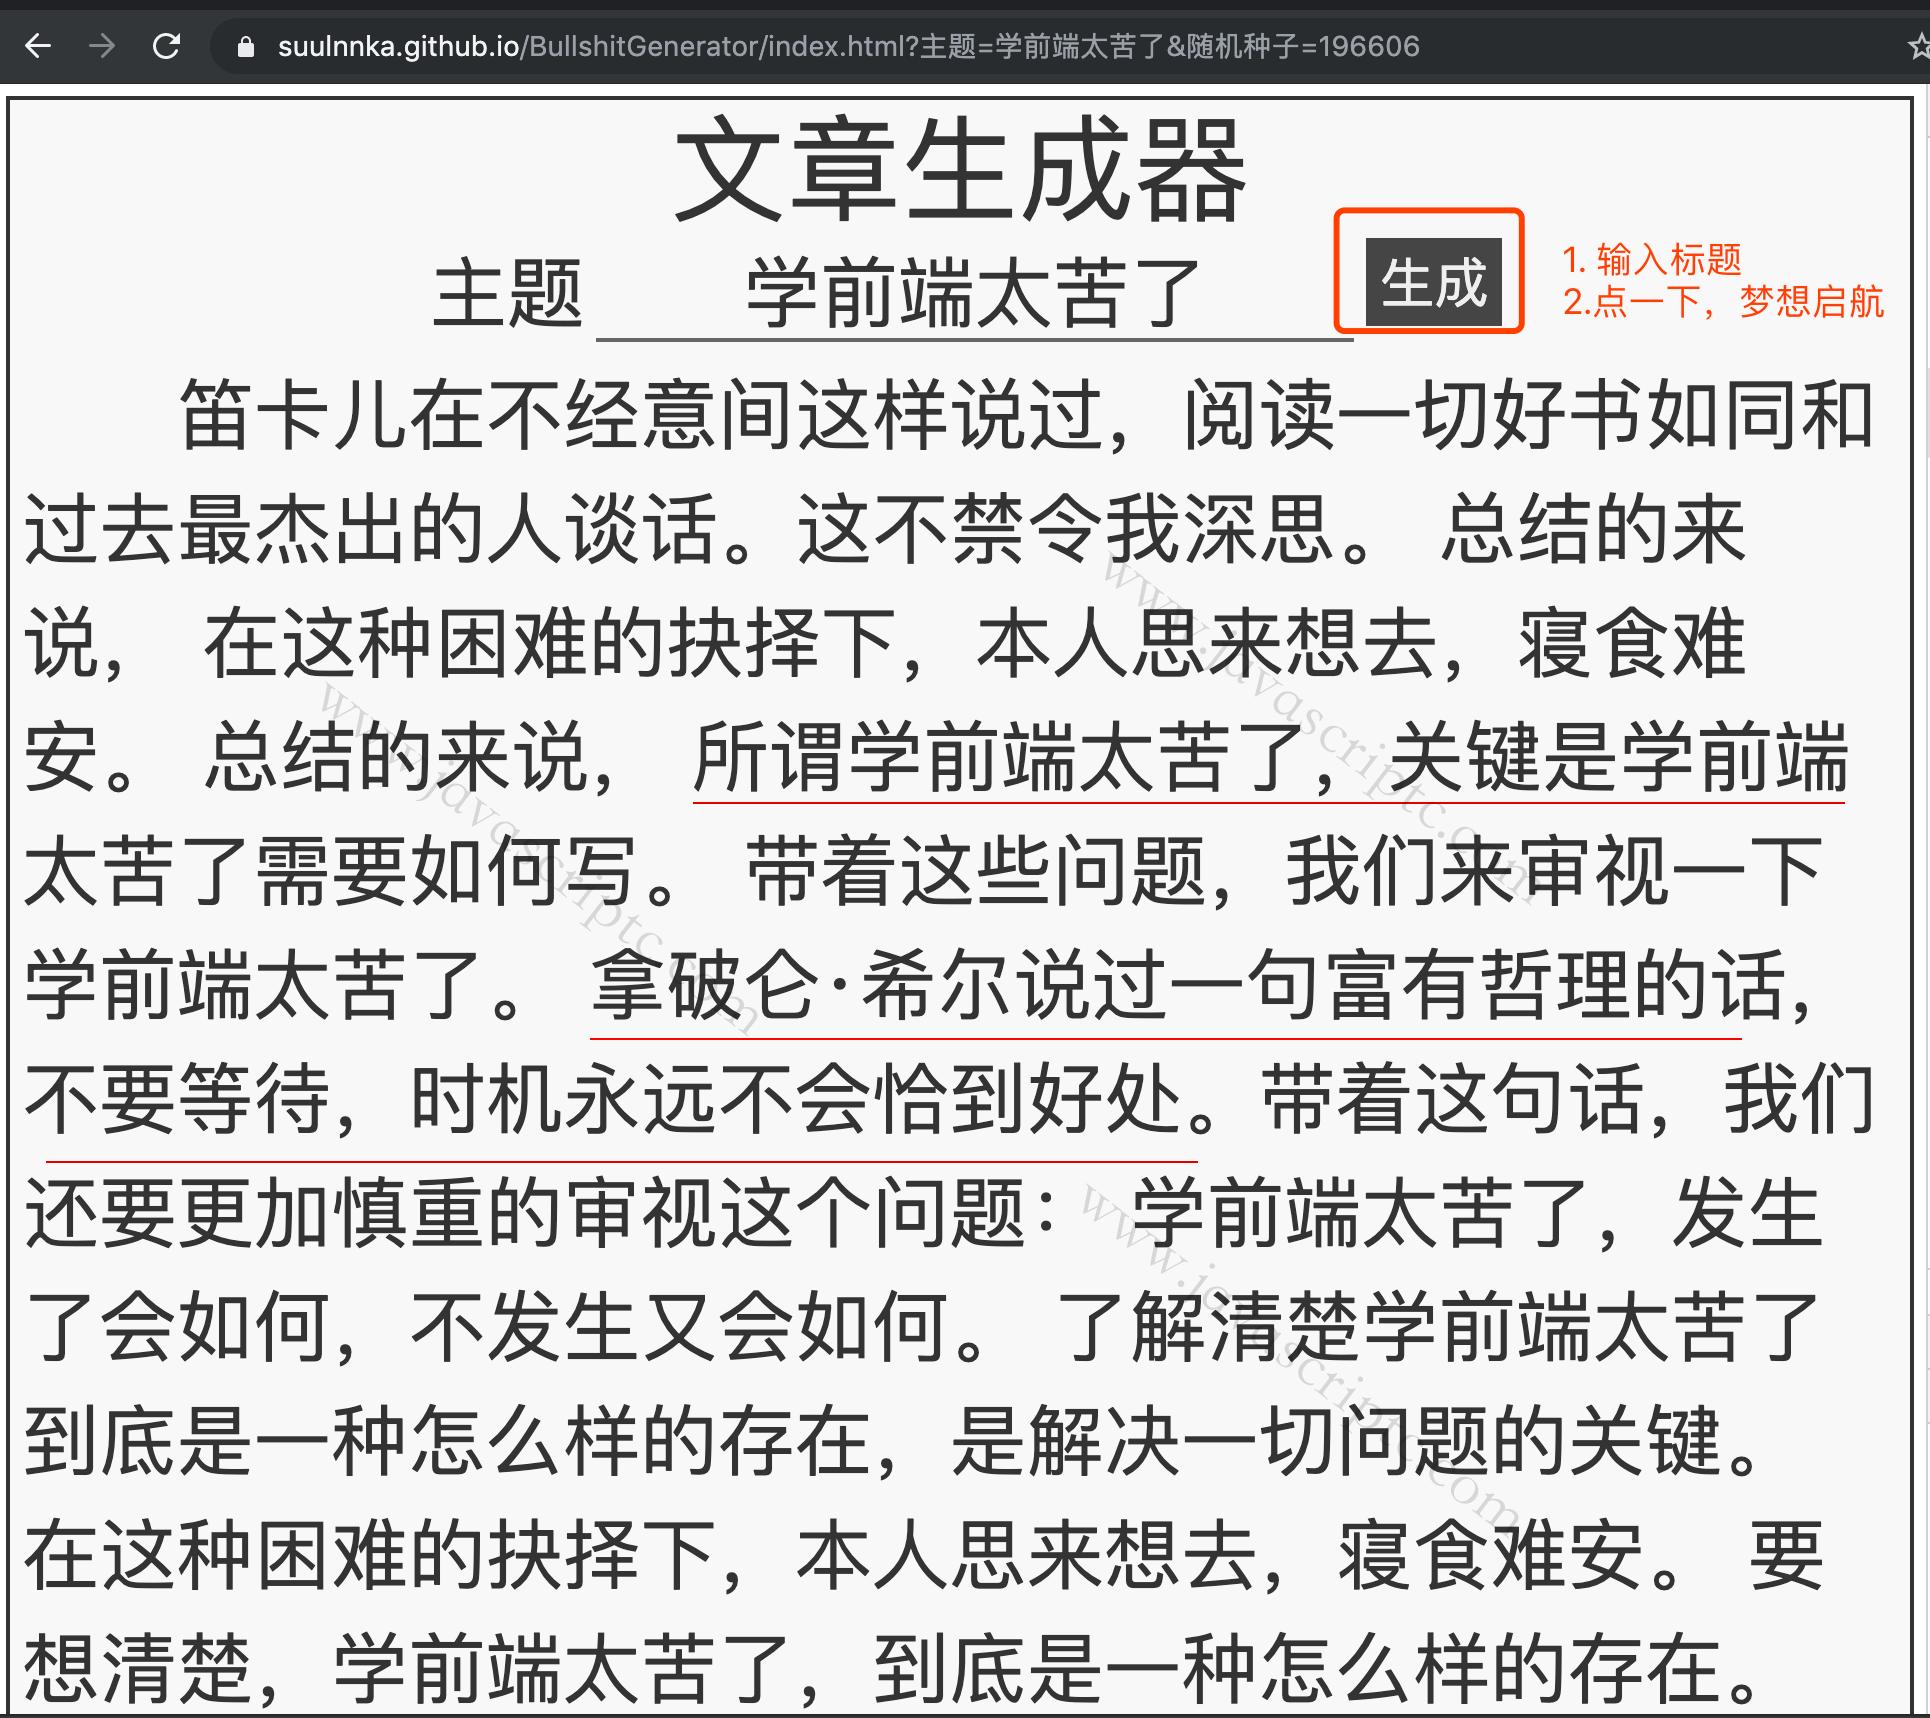 Js中文网 - www.javascriptC.com